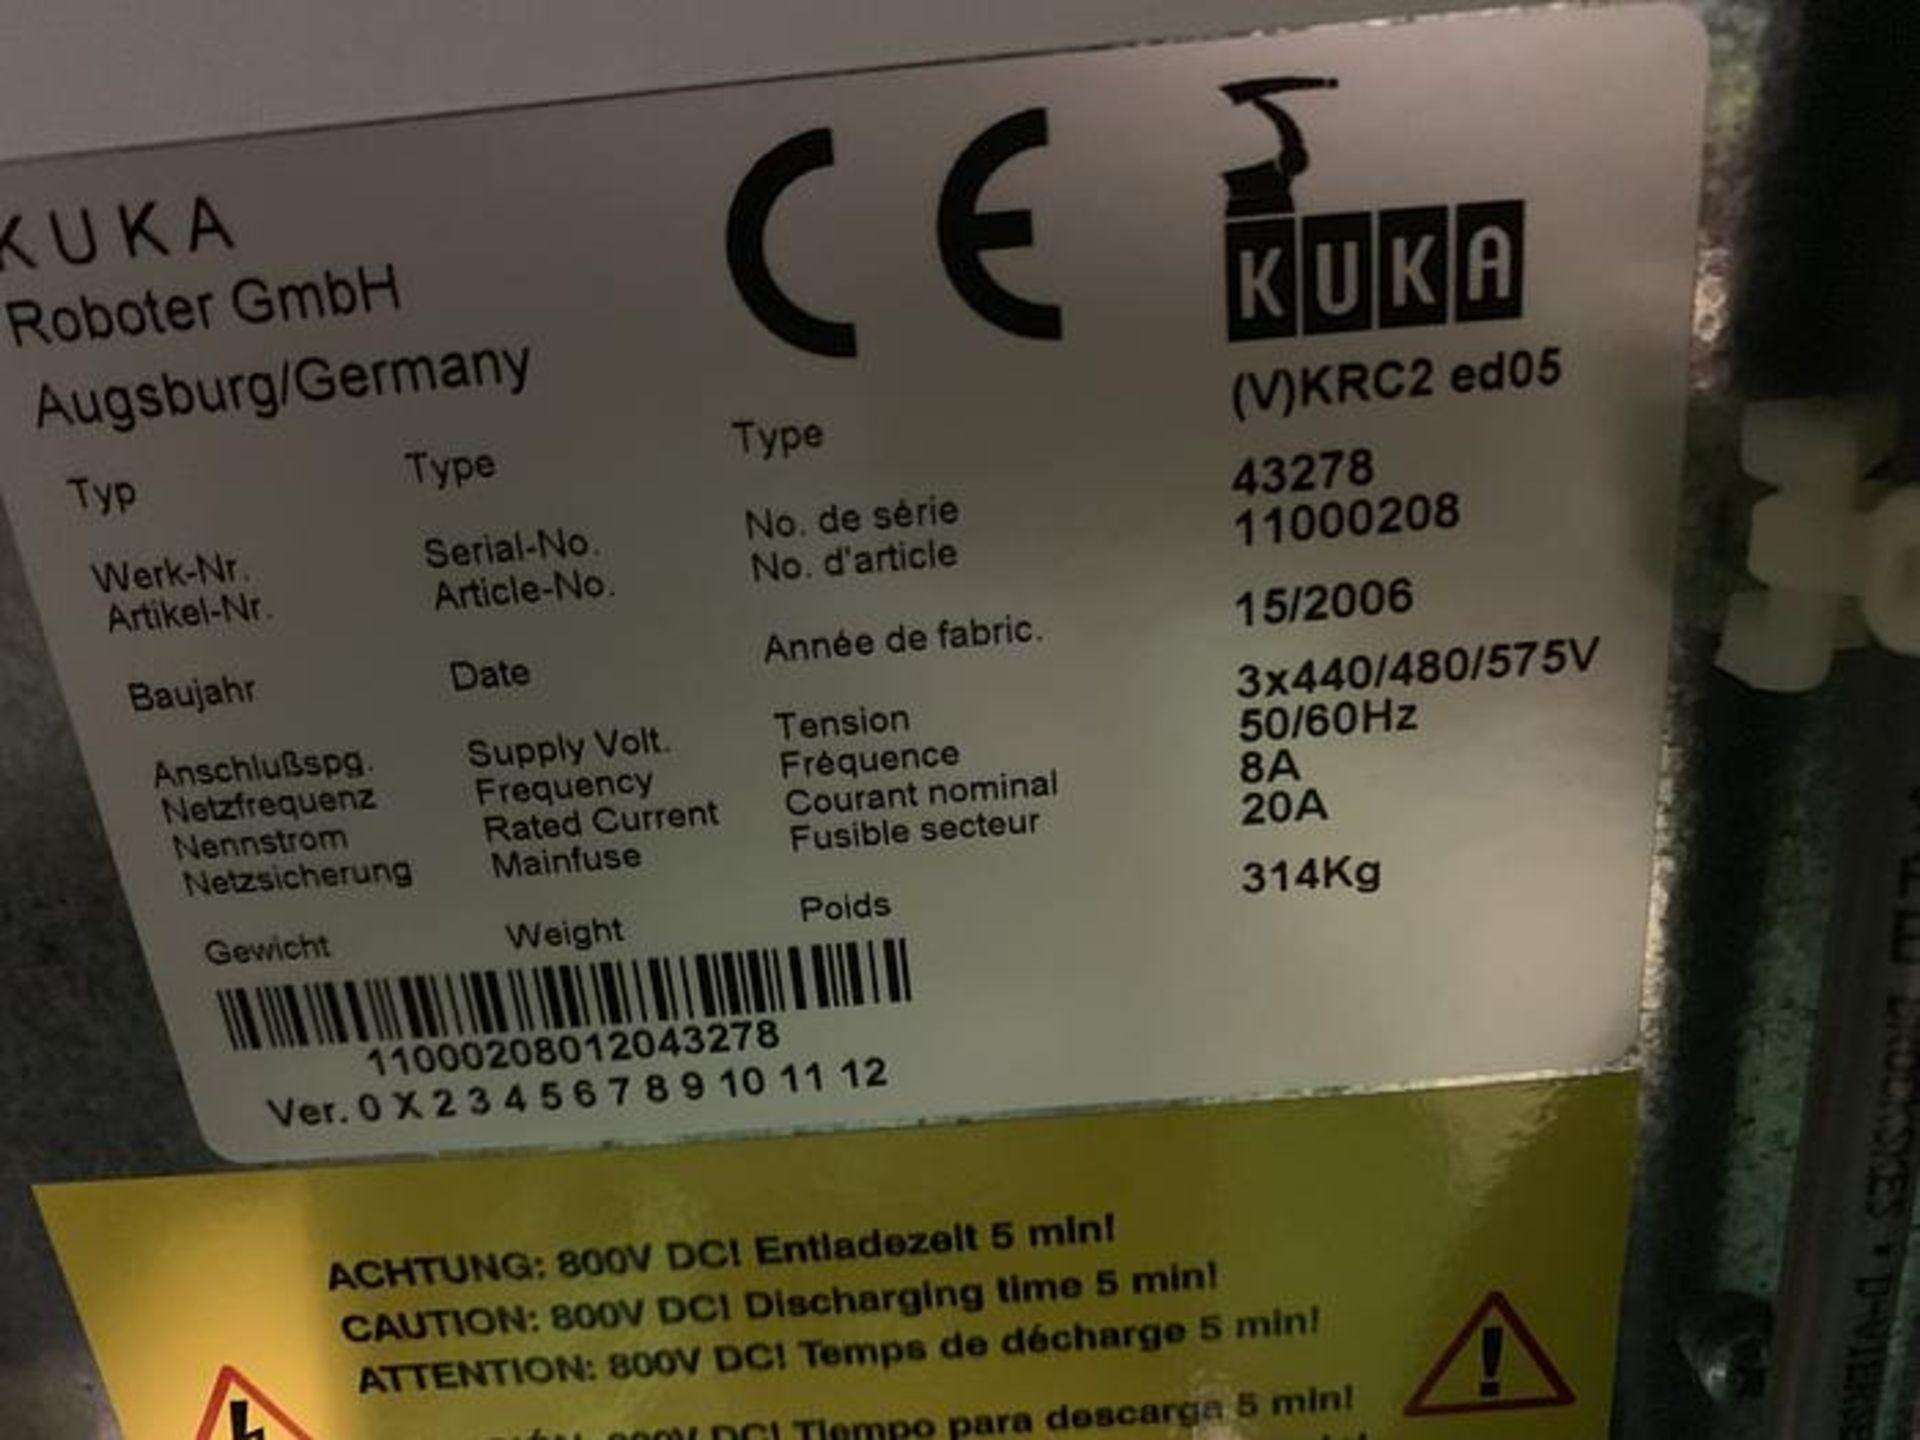 Lot 63 - KUKA KR6 ARC 6 AXIS CNC ROBOT 6KG X 1611MM W/KRC2 ed05 CONTROL, YEAR 2006, SN 880252/43278